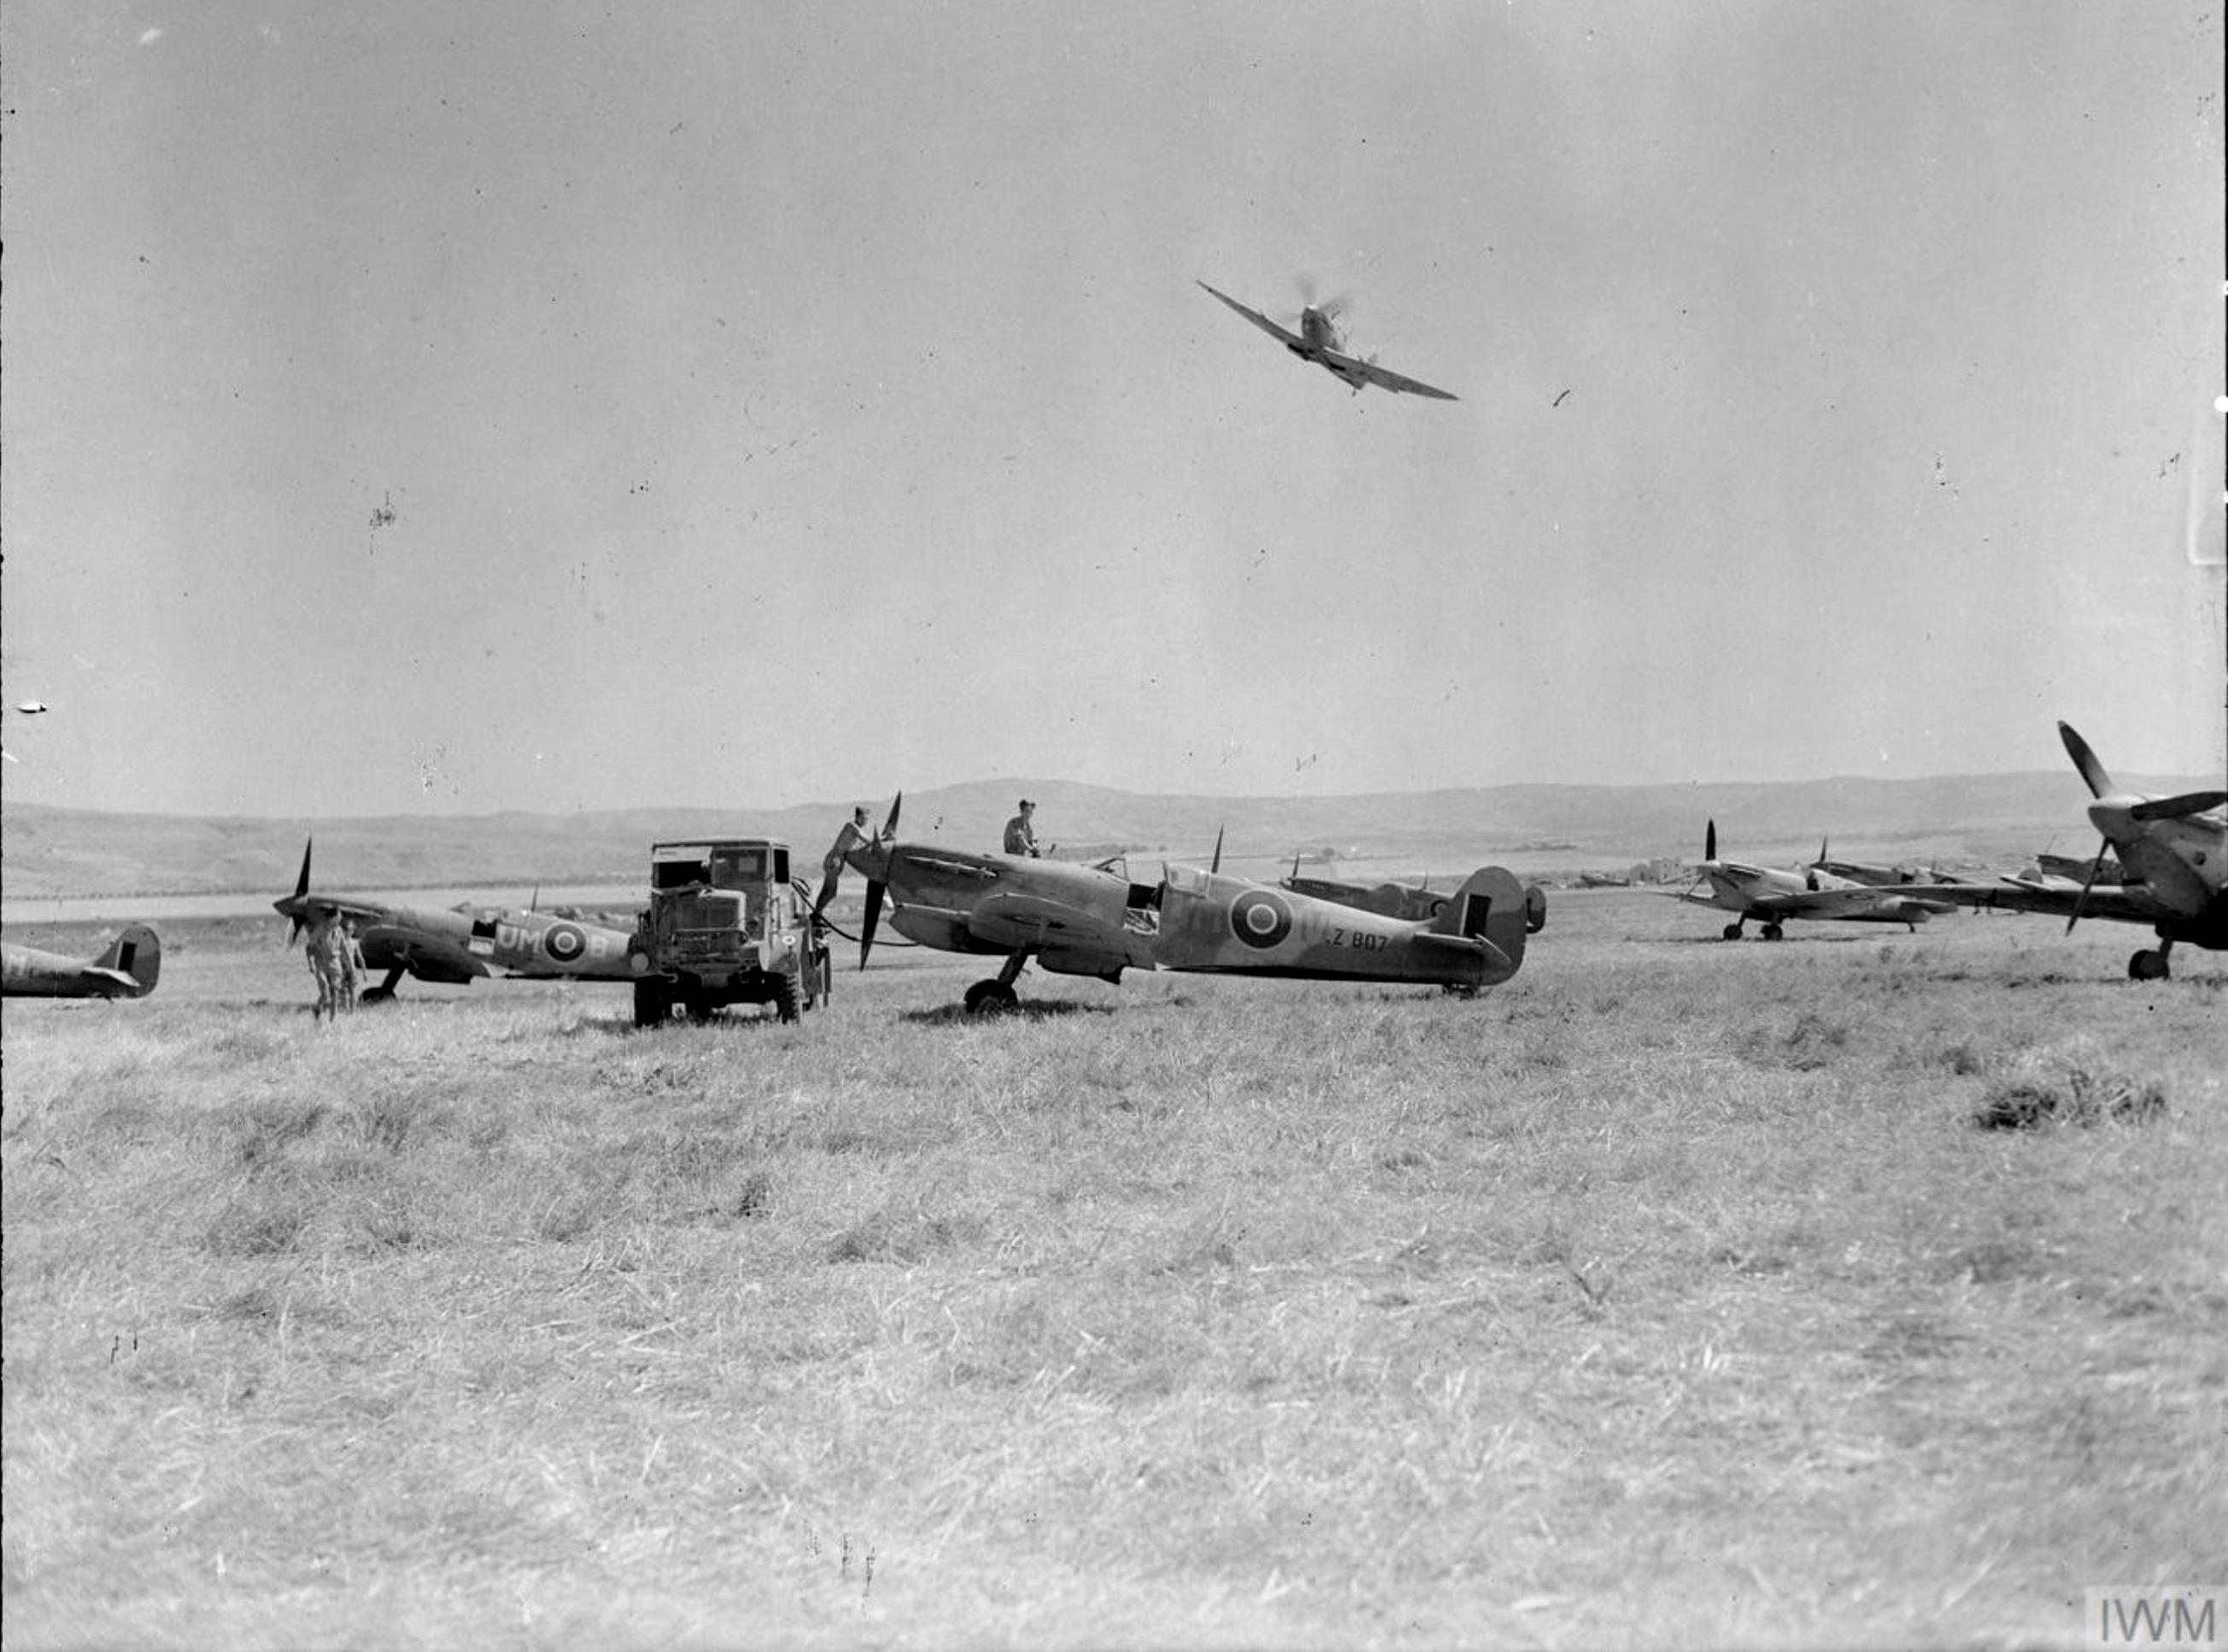 Spitfire MkVcTrop RAF 152Sqn UMV LZ807 UMB and UMM being refuelled at Lentini East Sicily 1943 IWM CNA1130